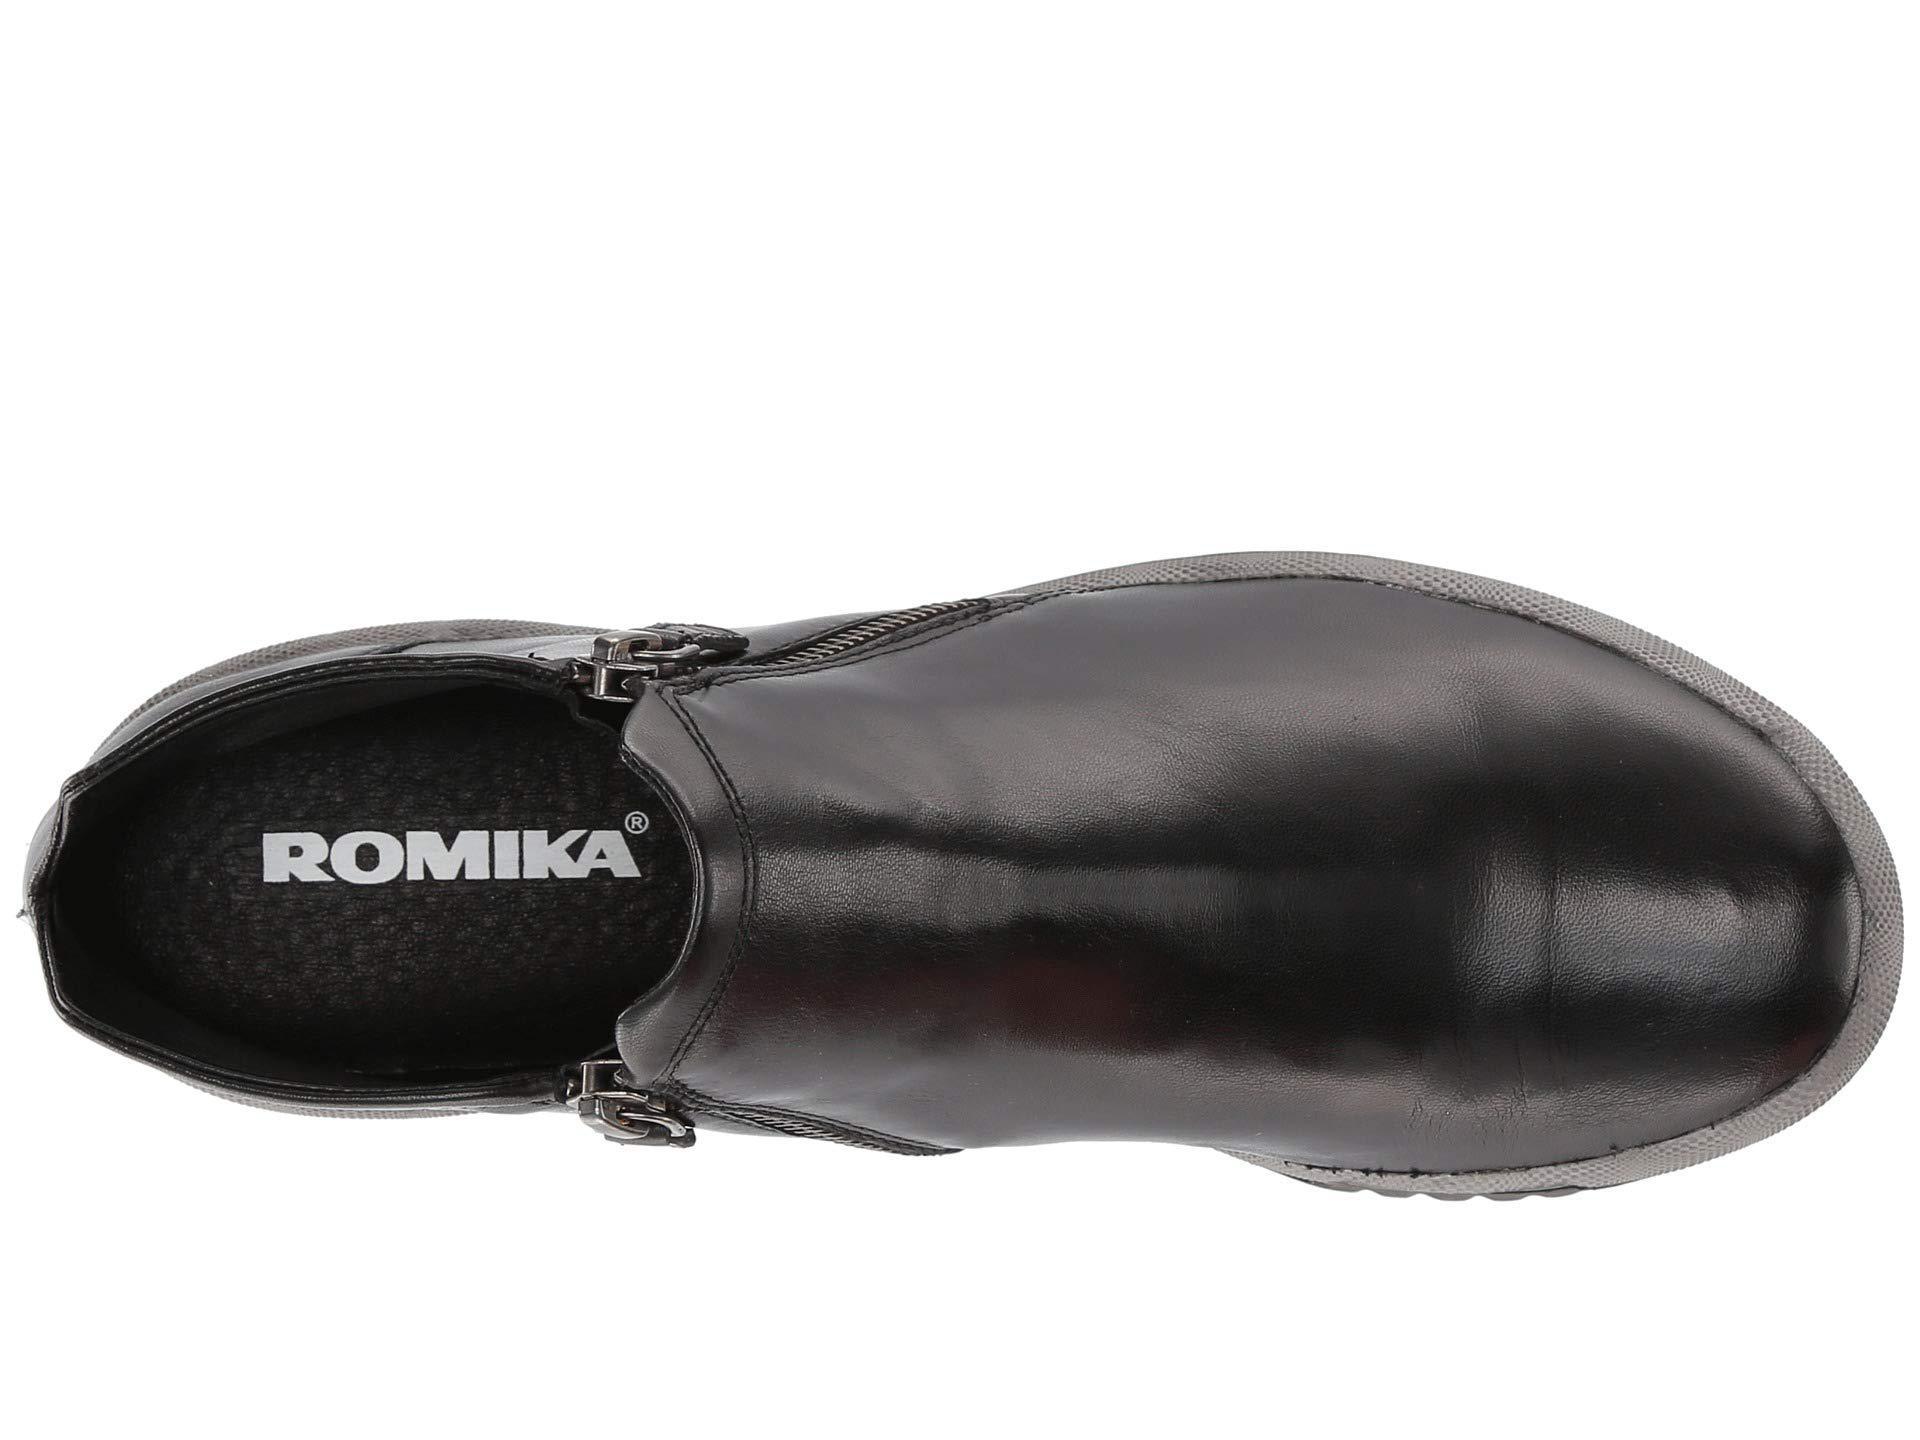 a3ac07b6fd1cf Lyst - Romika Cordoba 14 (black) Women s Shoes in Black